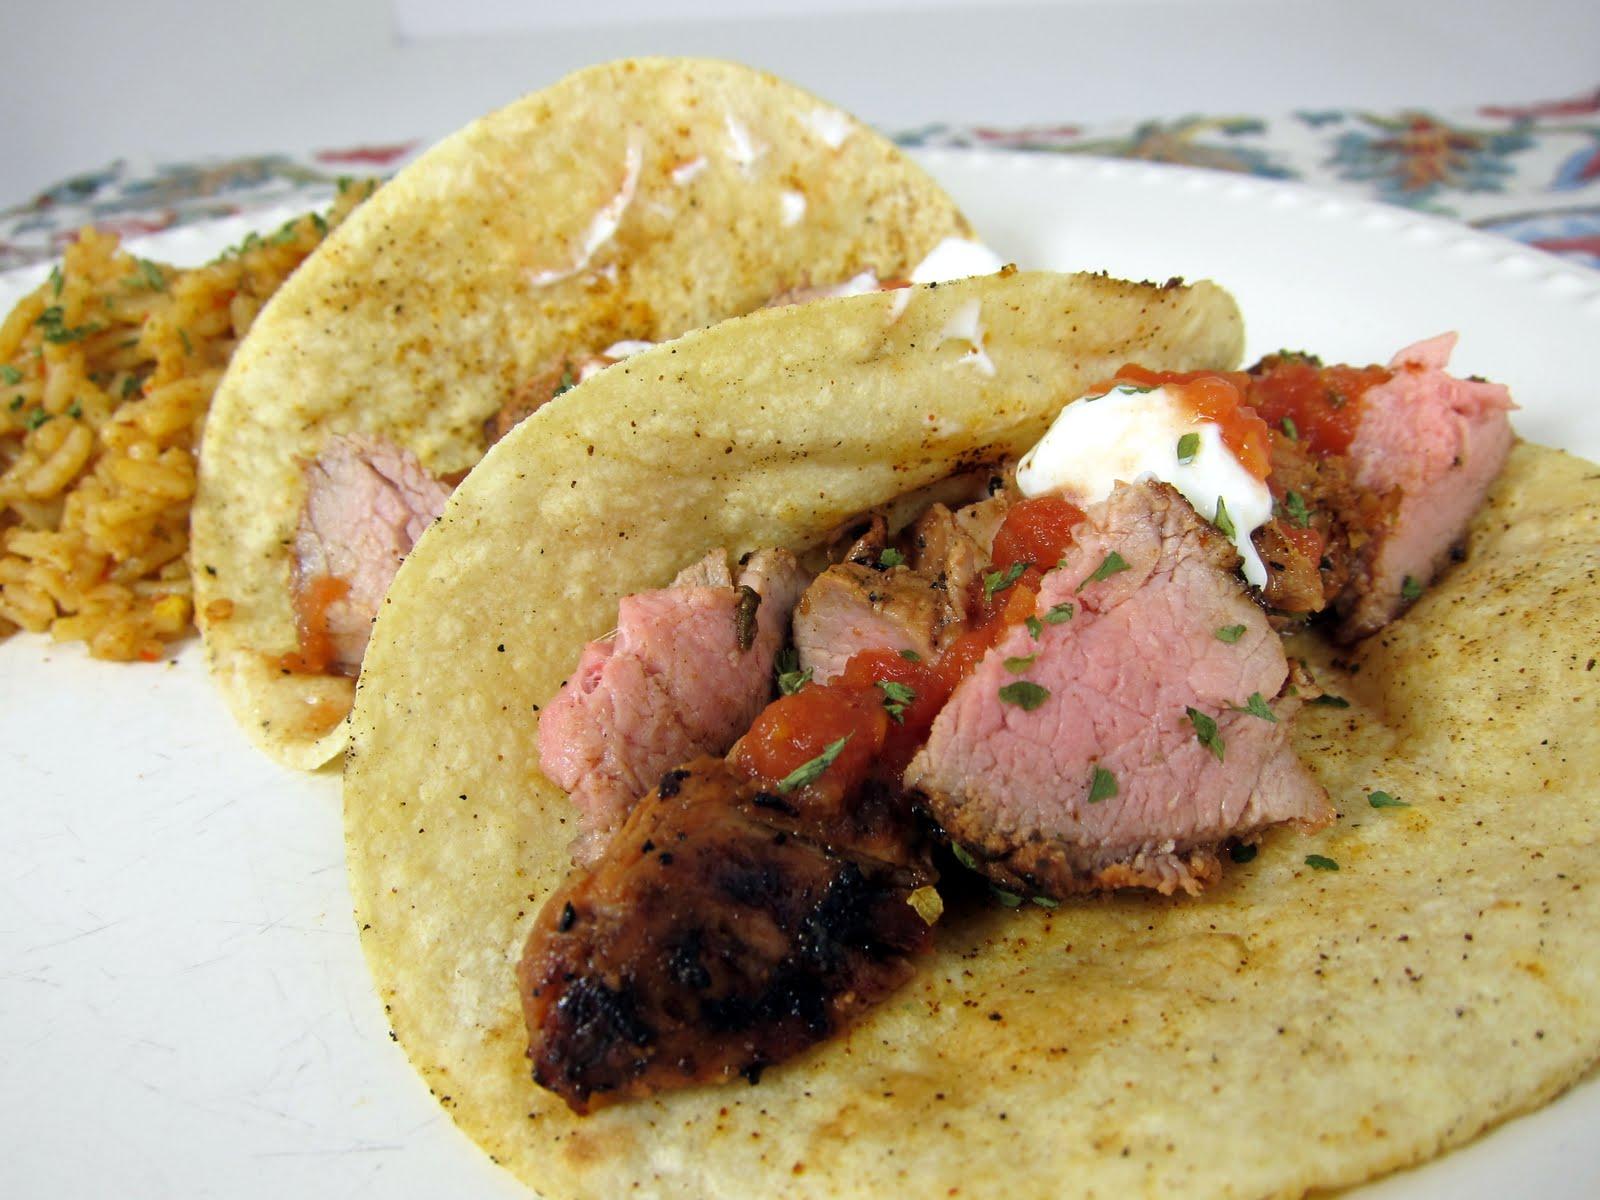 Grilled Pork Tacos Recipe - pork tenderloin marinated in lime juice ...